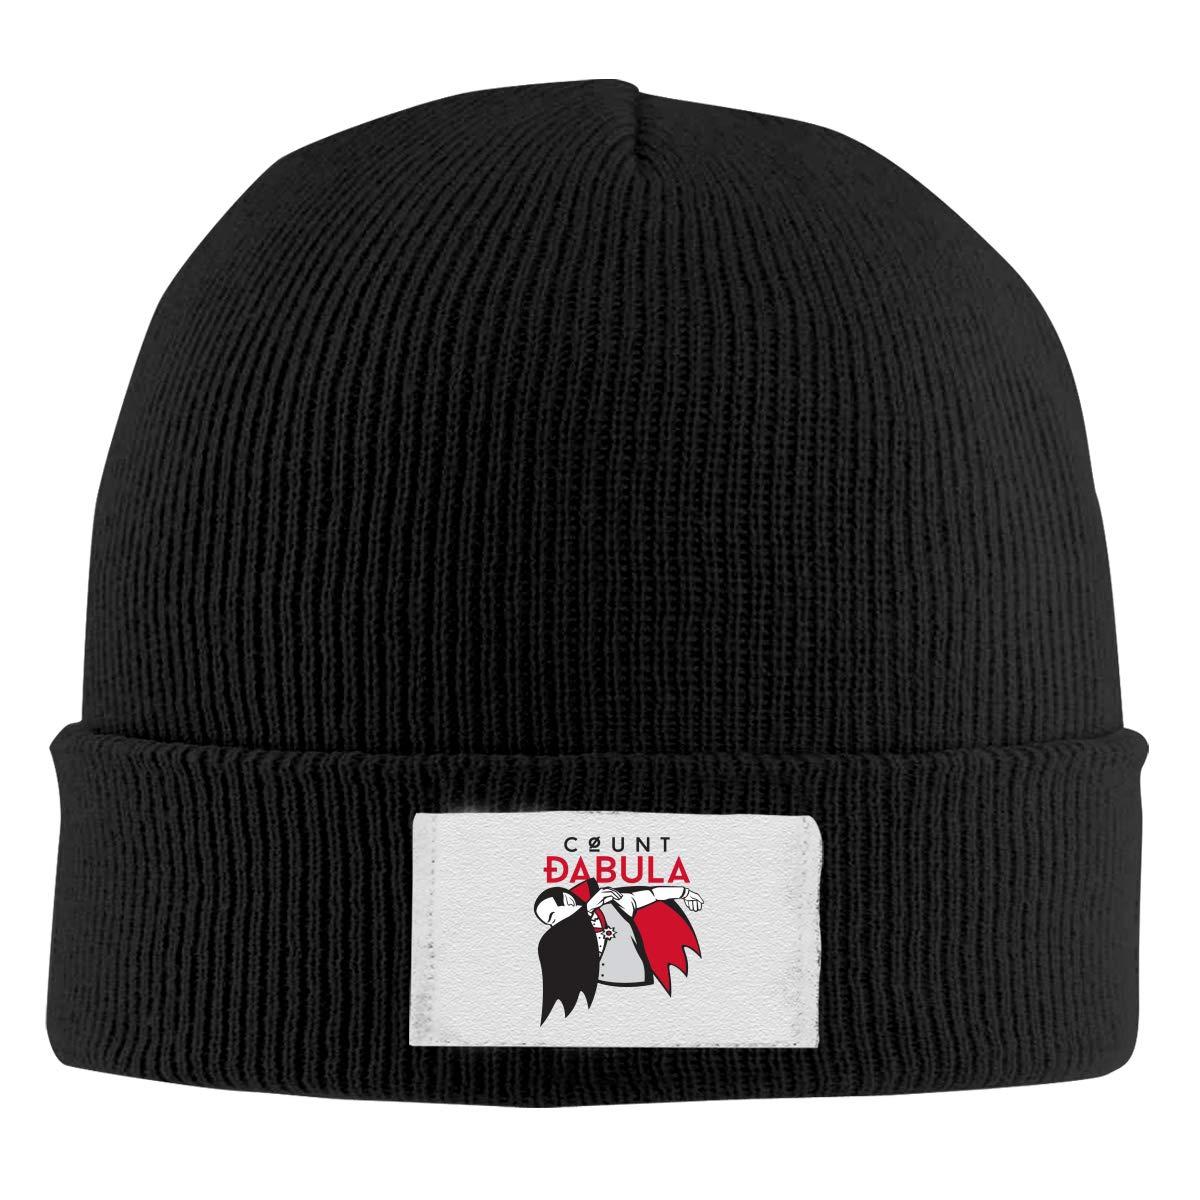 Dunpaiaa Skull Caps Count DABULA Winter Warm Knit Hats Stretchy Cuff Beanie Hat Black